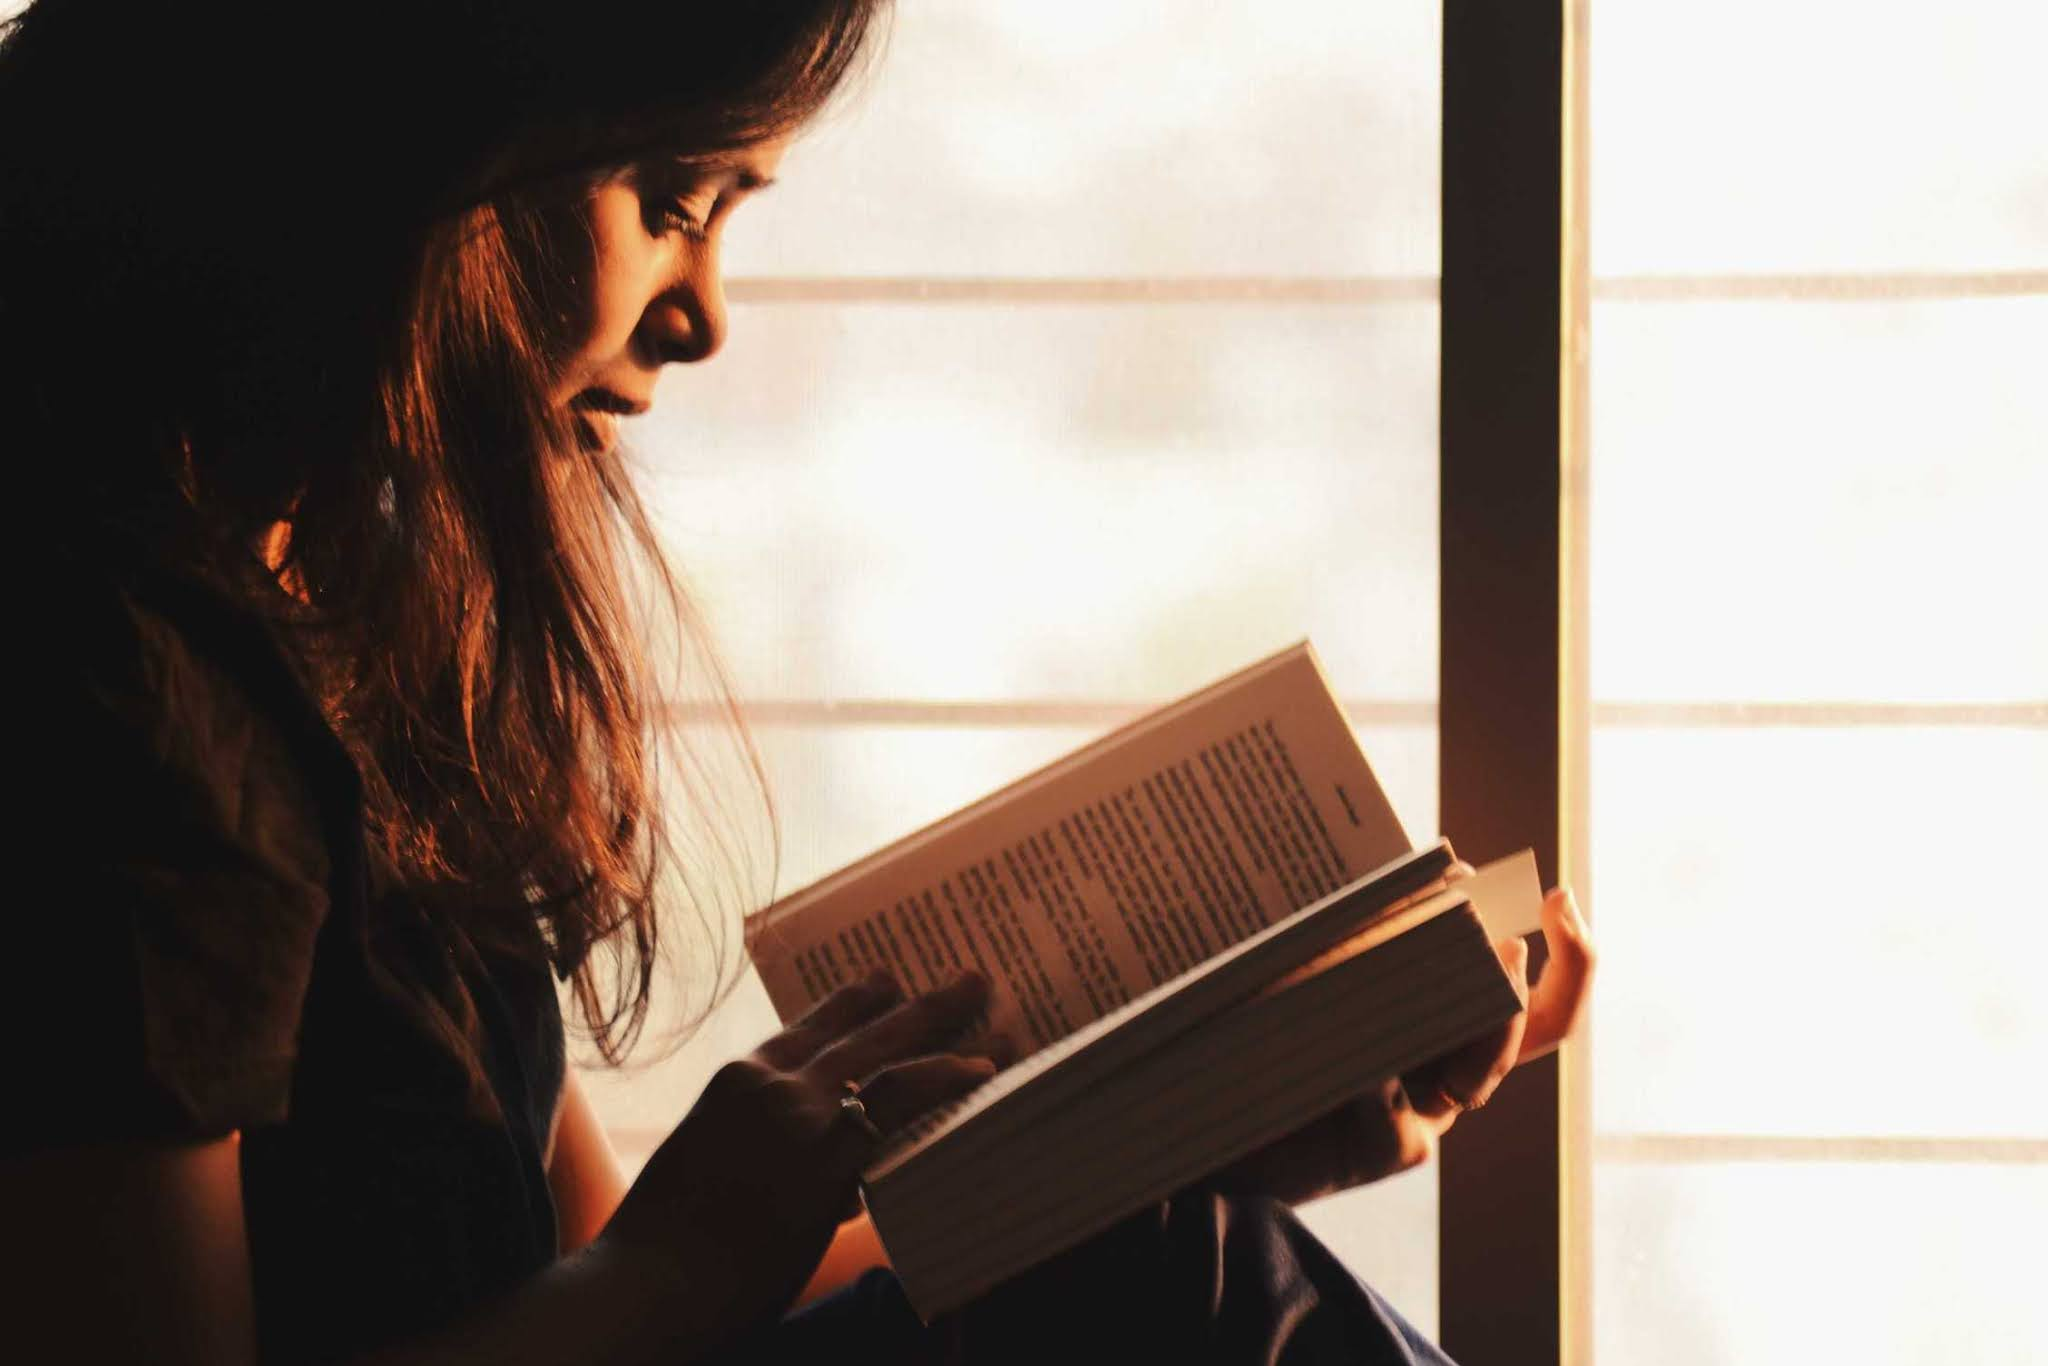 someone reading